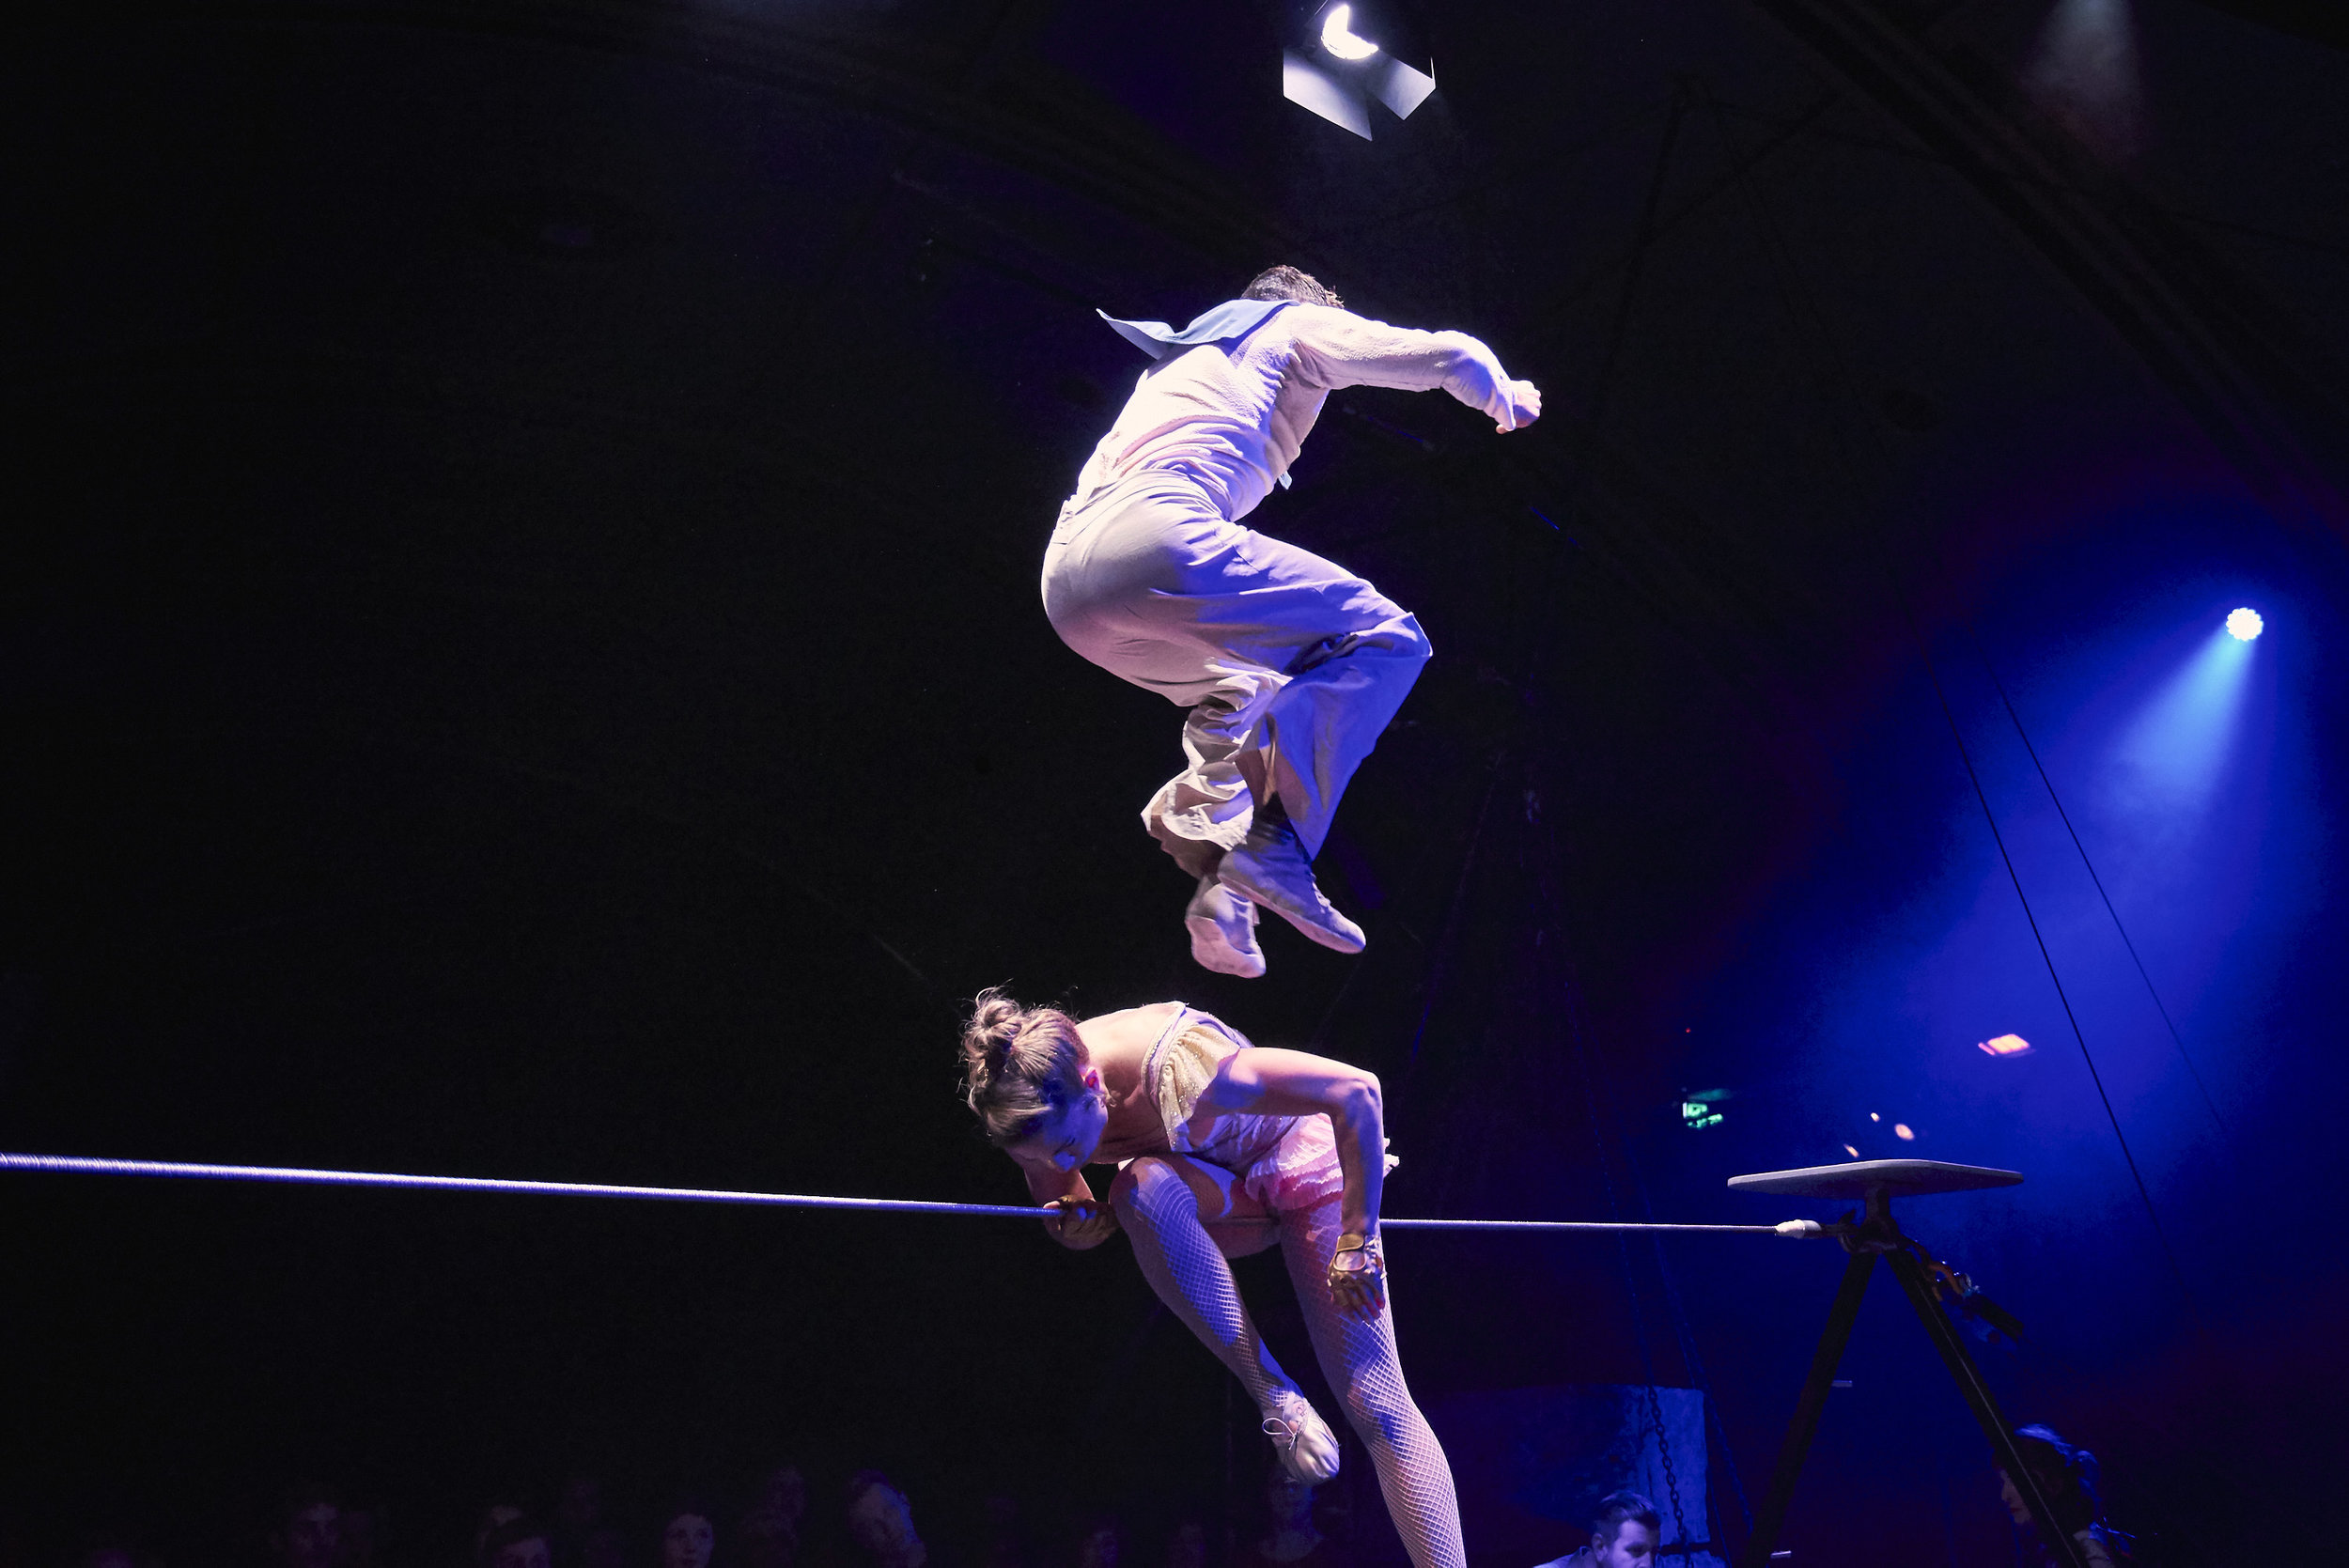 CircusOz2019_Wunderage_JessMcCrindle_LachyShelley_PhotographyAaronWalker_063.jpg